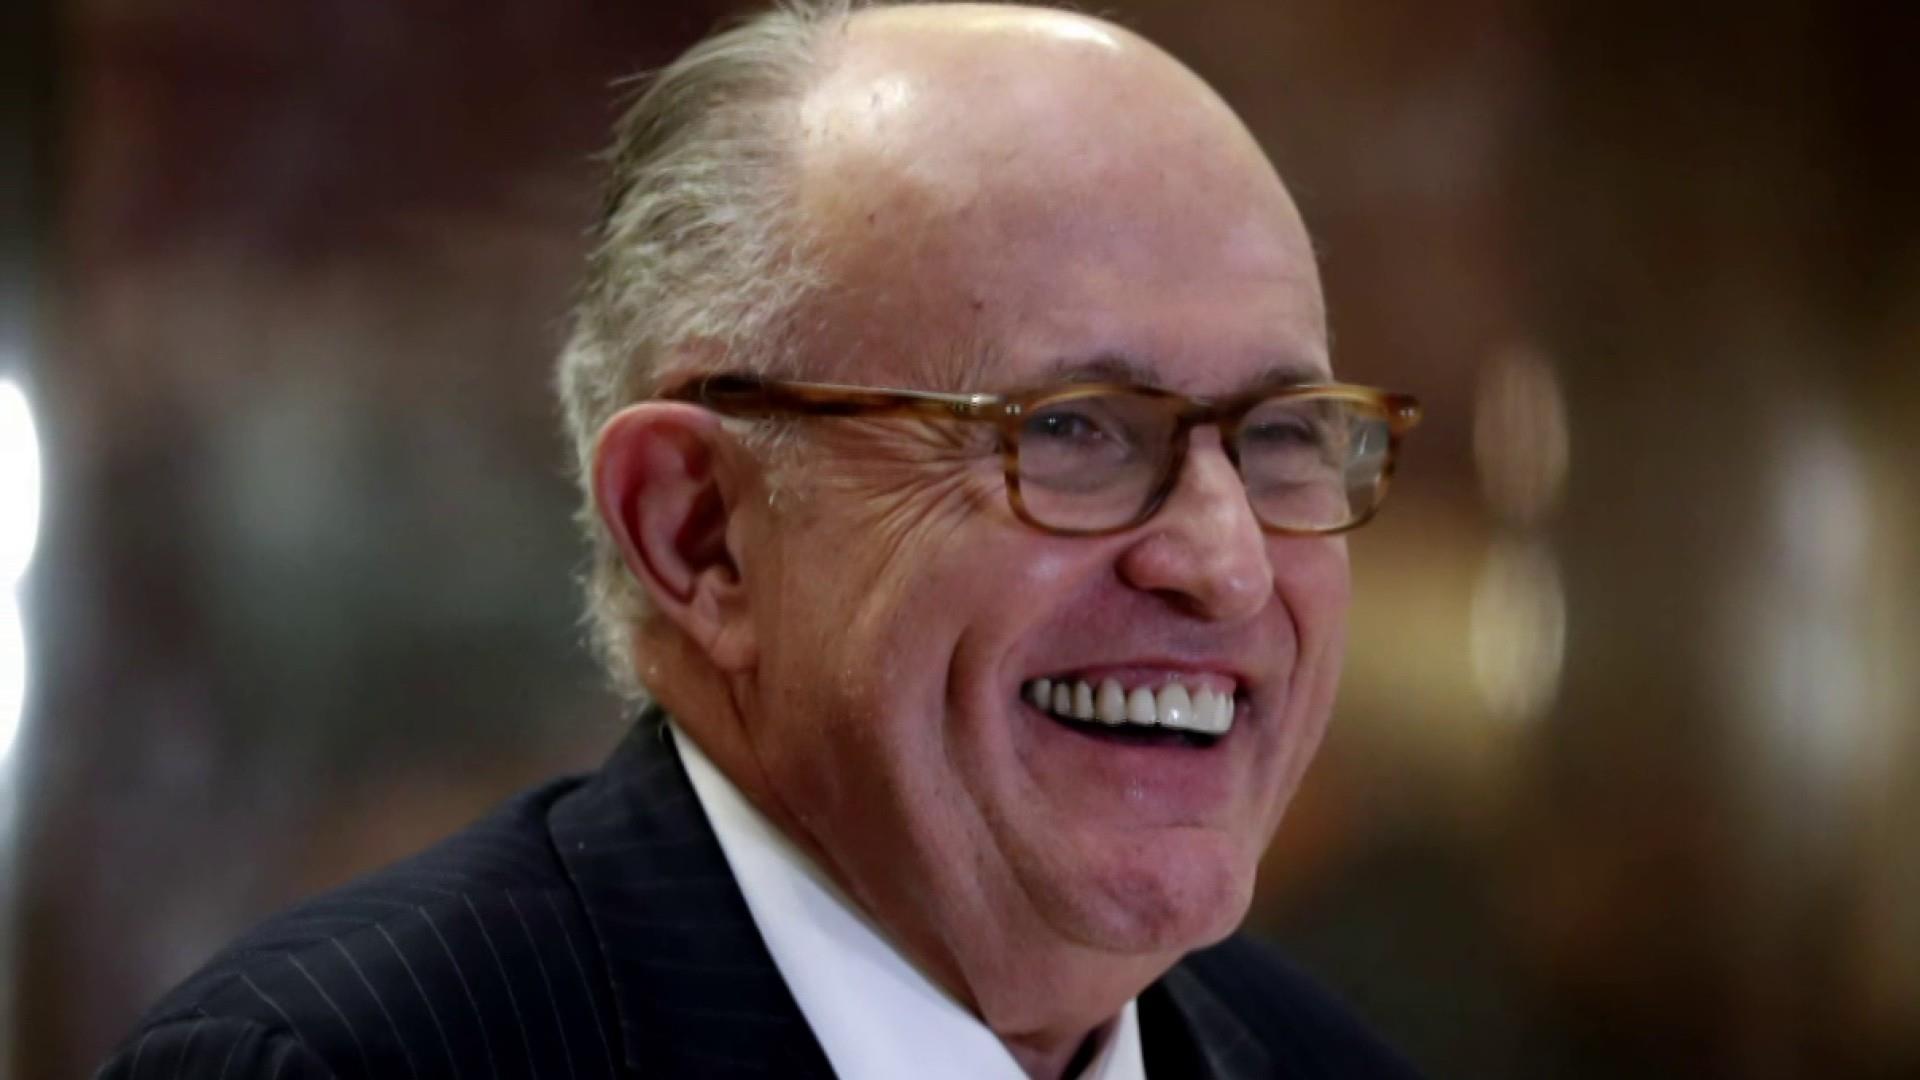 Giuliani tried to secure visa for ousted Ukrainian prosecutor